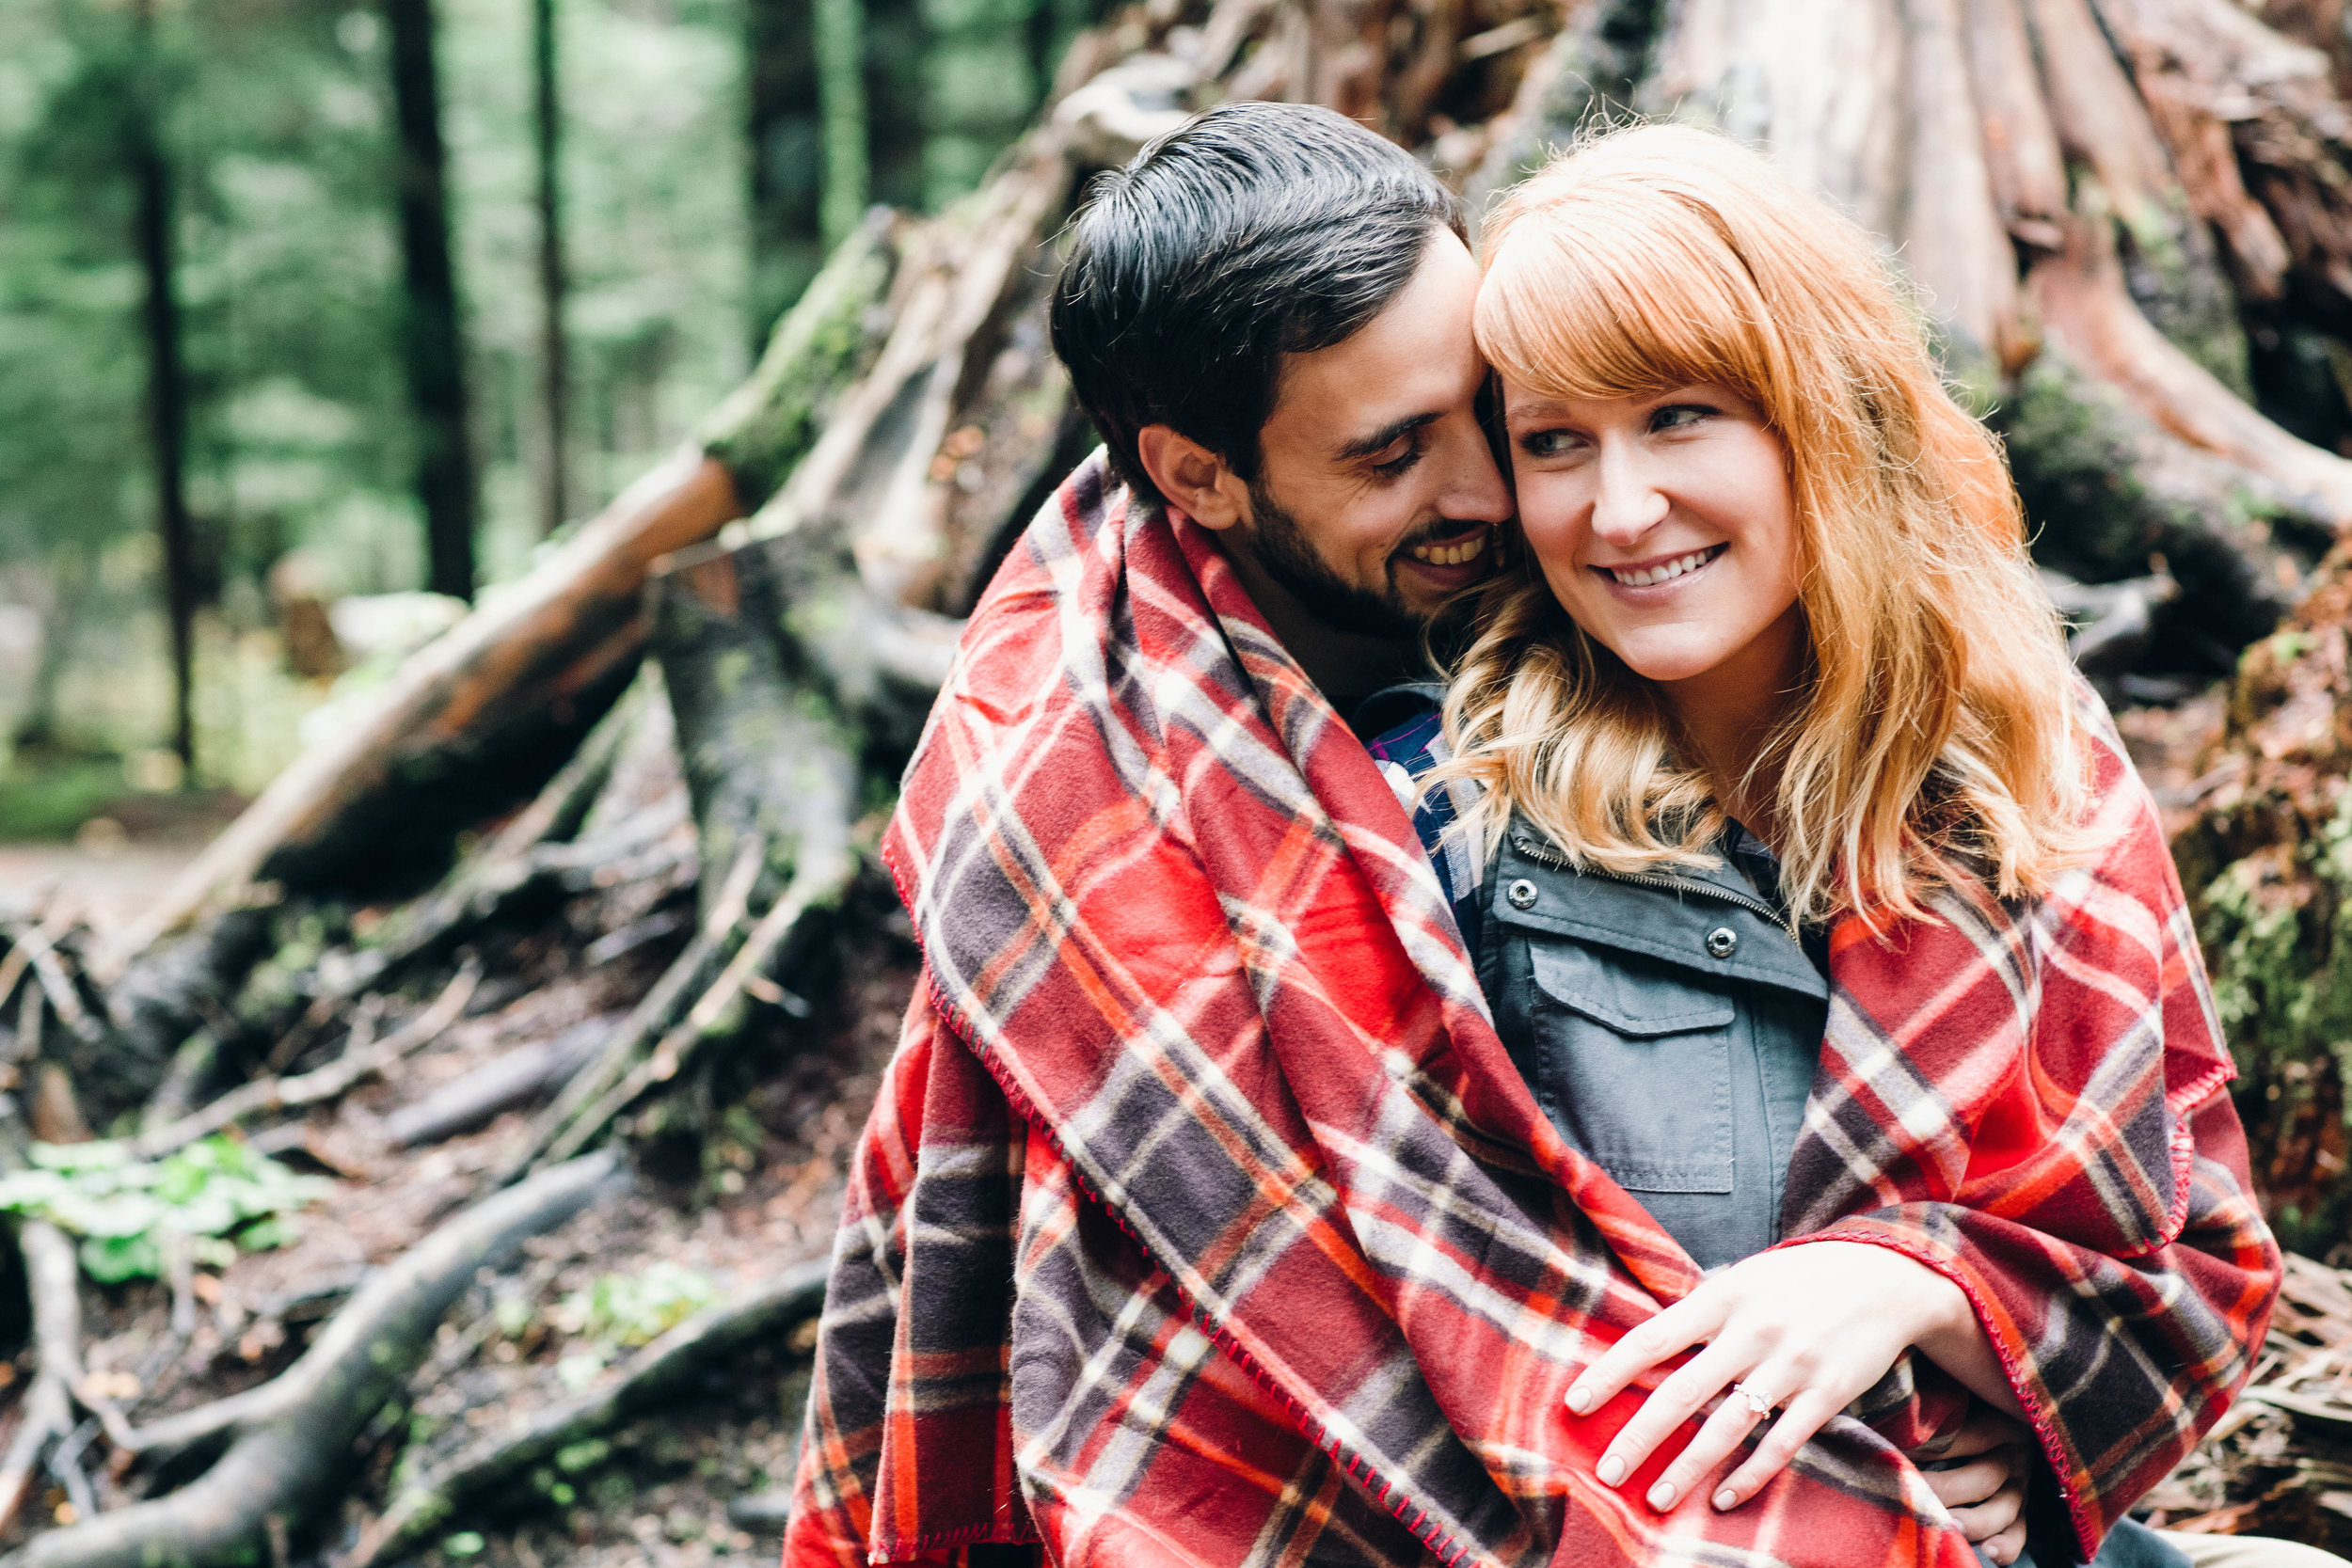 Ryan+Nicole_Franklin+Falls+Engagement_APW2016_23.JPG